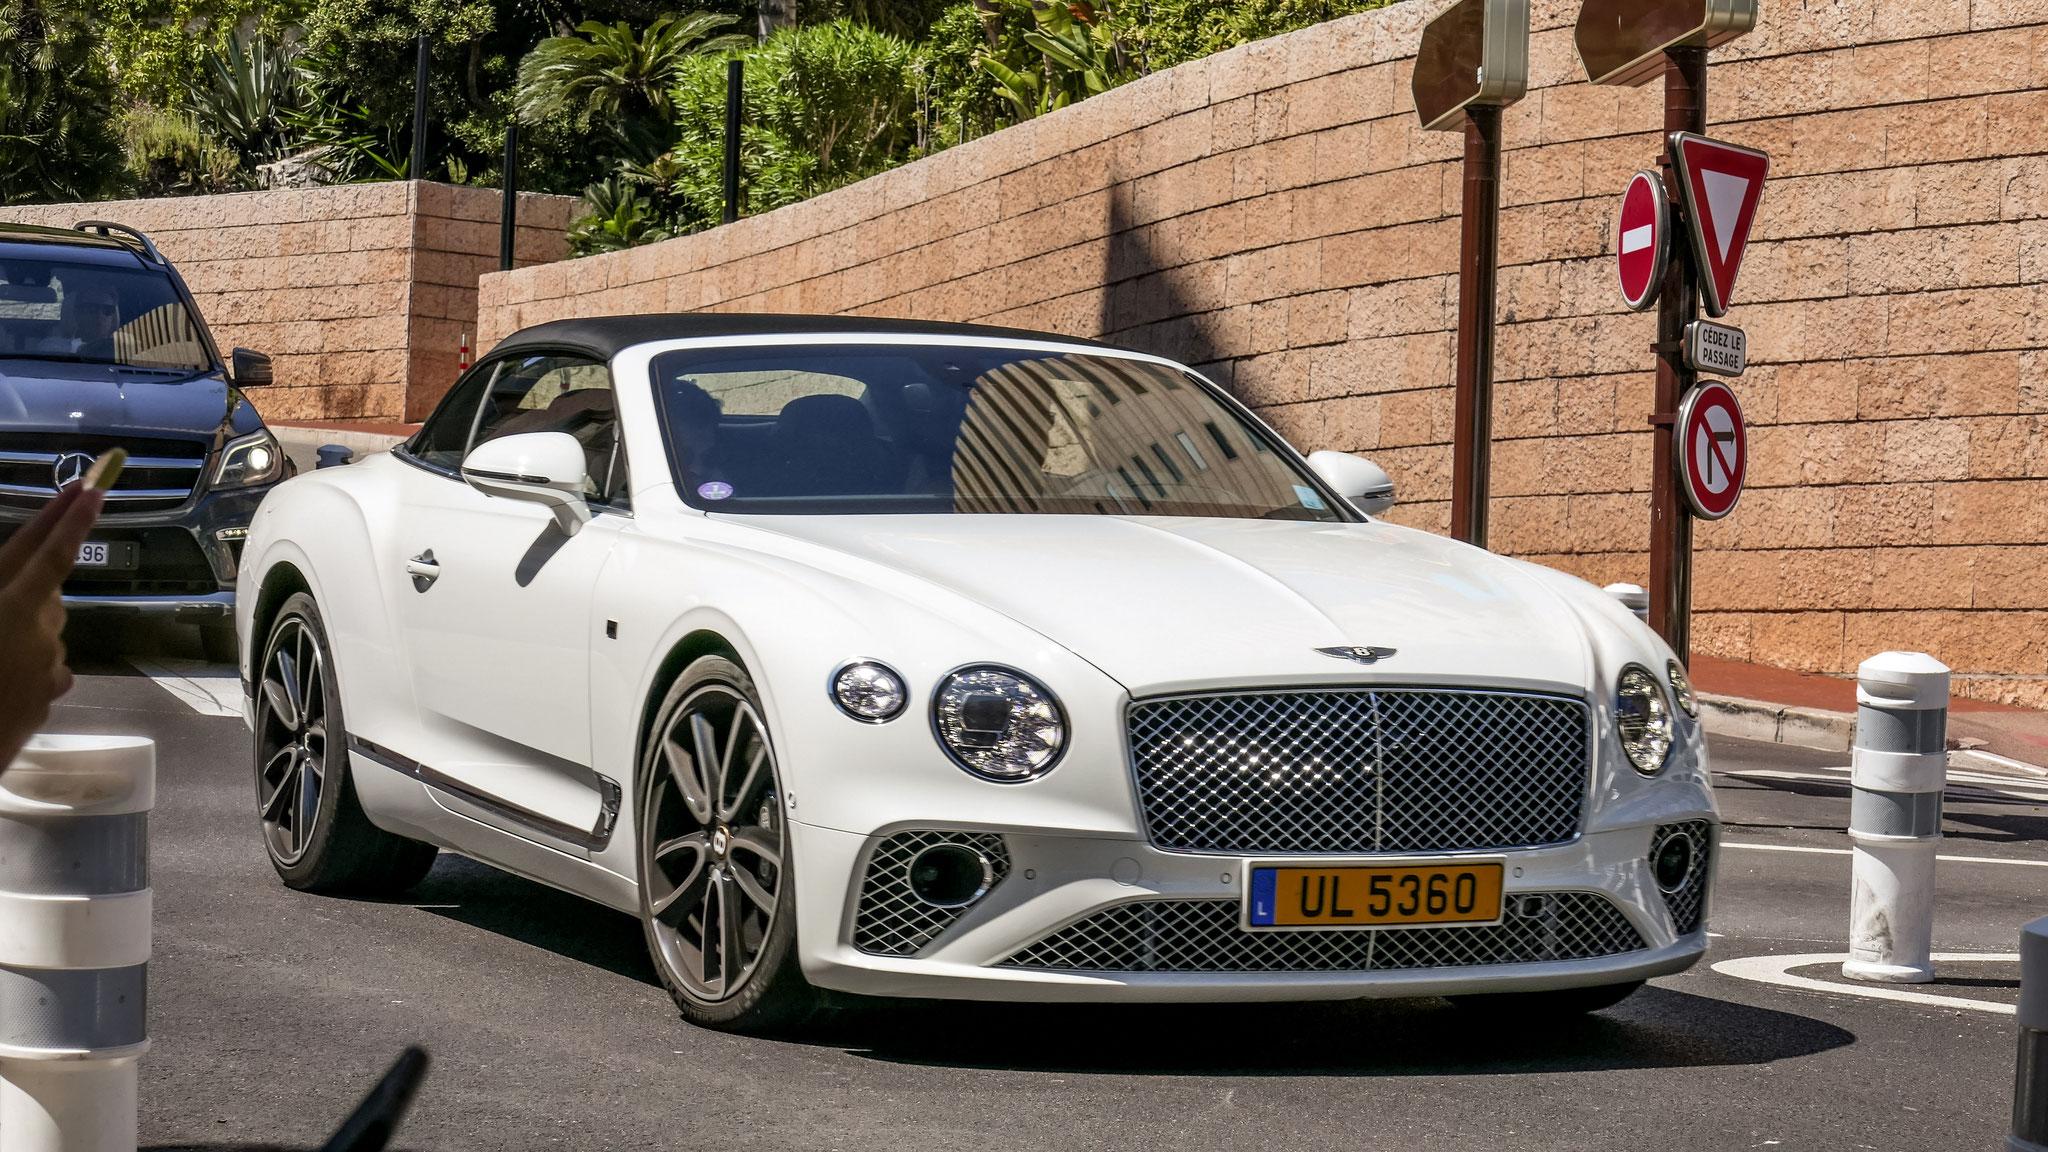 Bentley Continental GTC - UL-5360 (LUX)